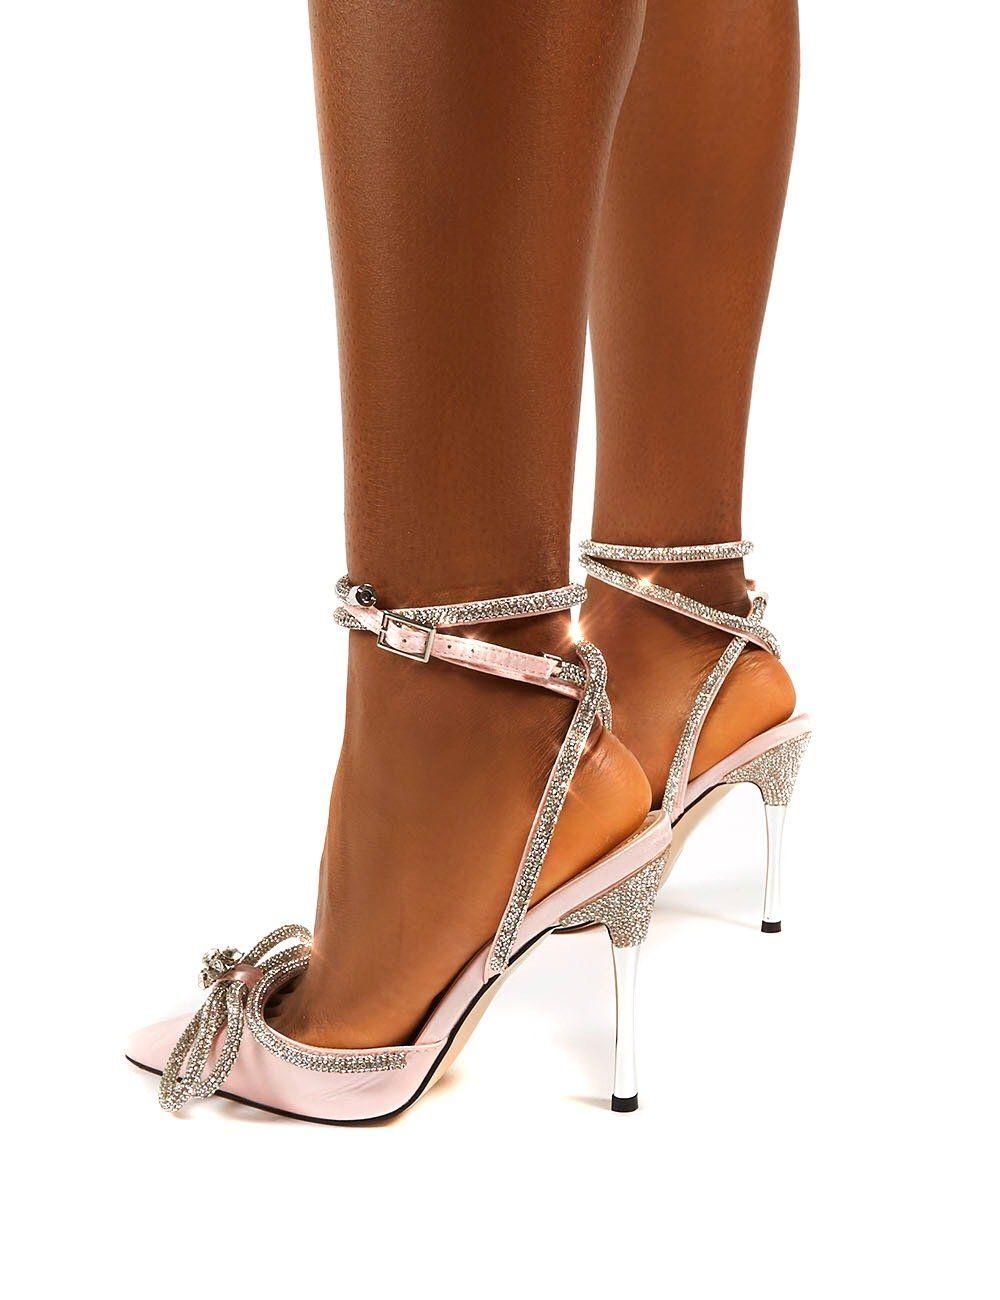 Natalia Rose Gold PU Lace Up Flat Sandals | Public Desire